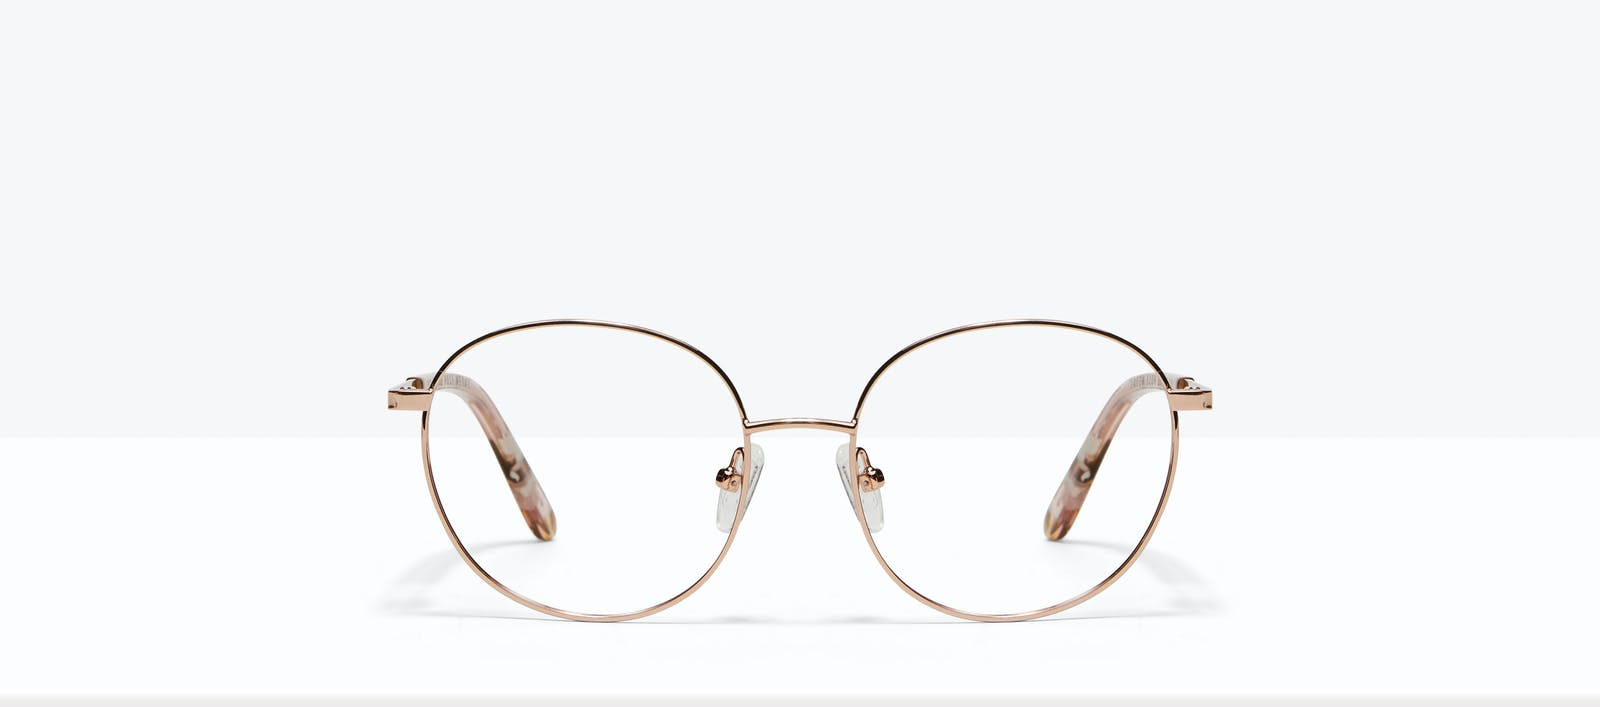 089b8ff8b6 Affordable Fashion Glasses Round Eyeglasses Women Joy Petite Rose Metal  Front